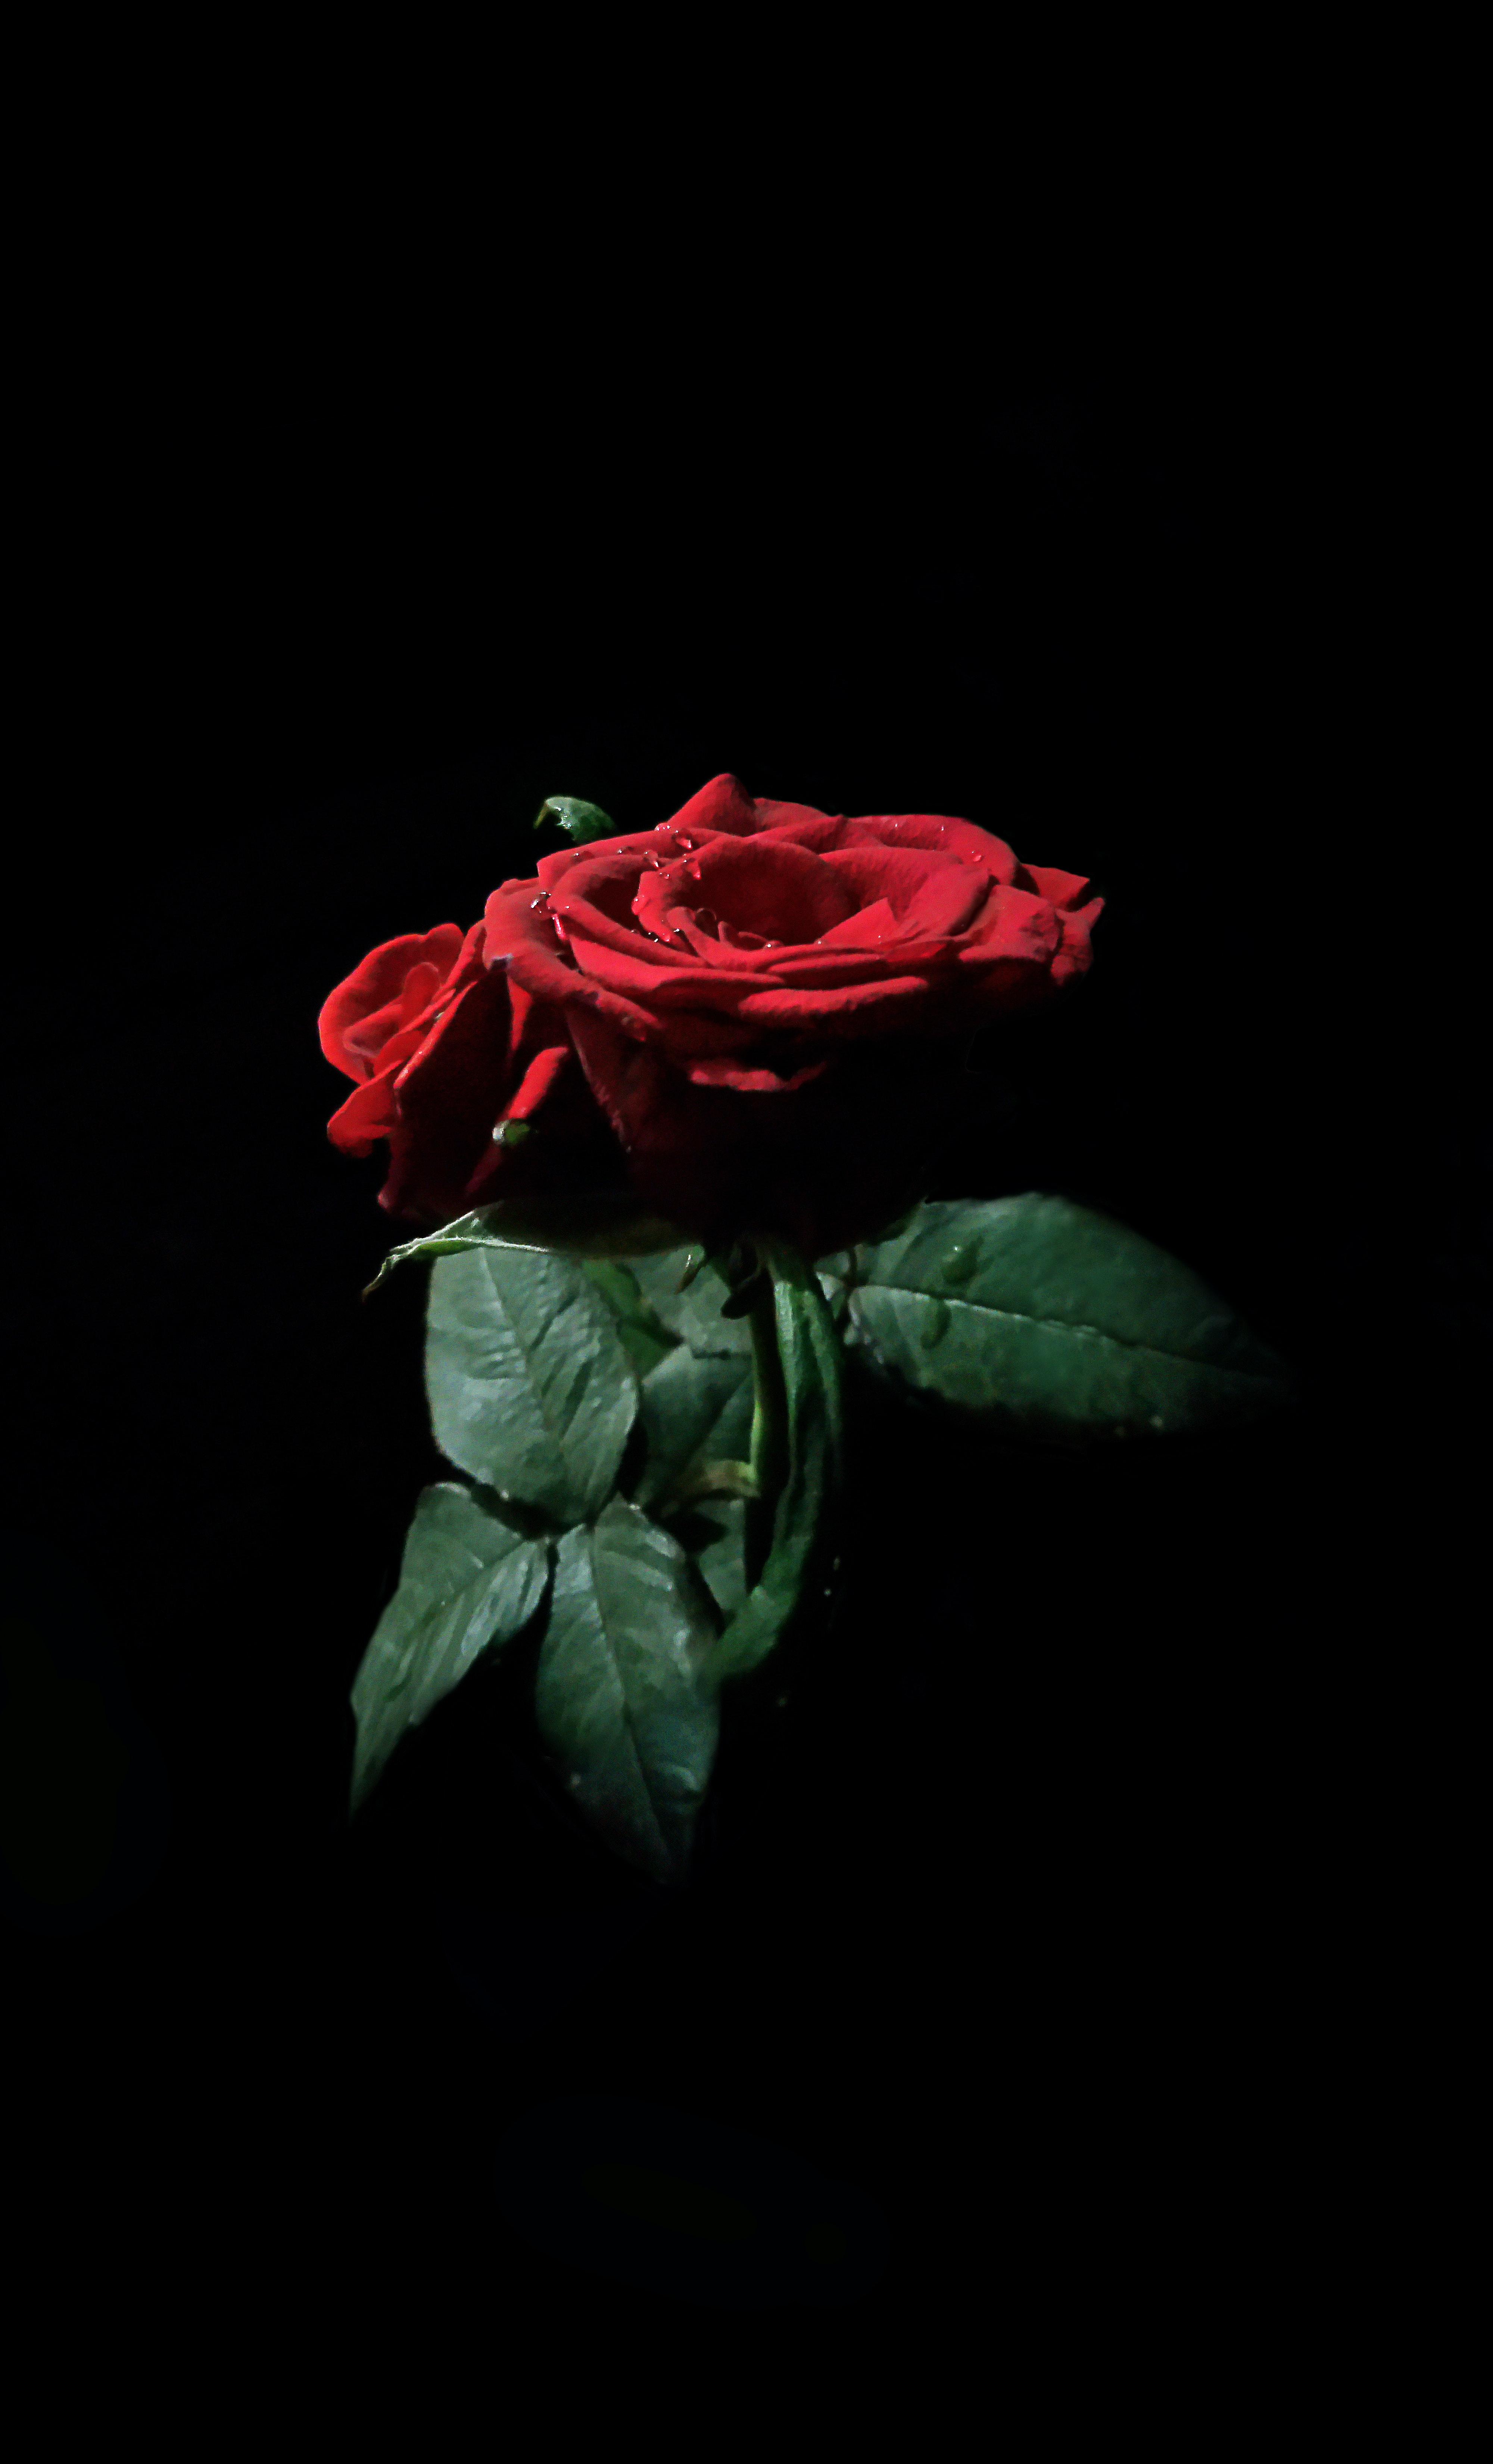 pexels photo 1729247.jpeg?cs=srgb&dl=black background darkness night photography red rose 1729247